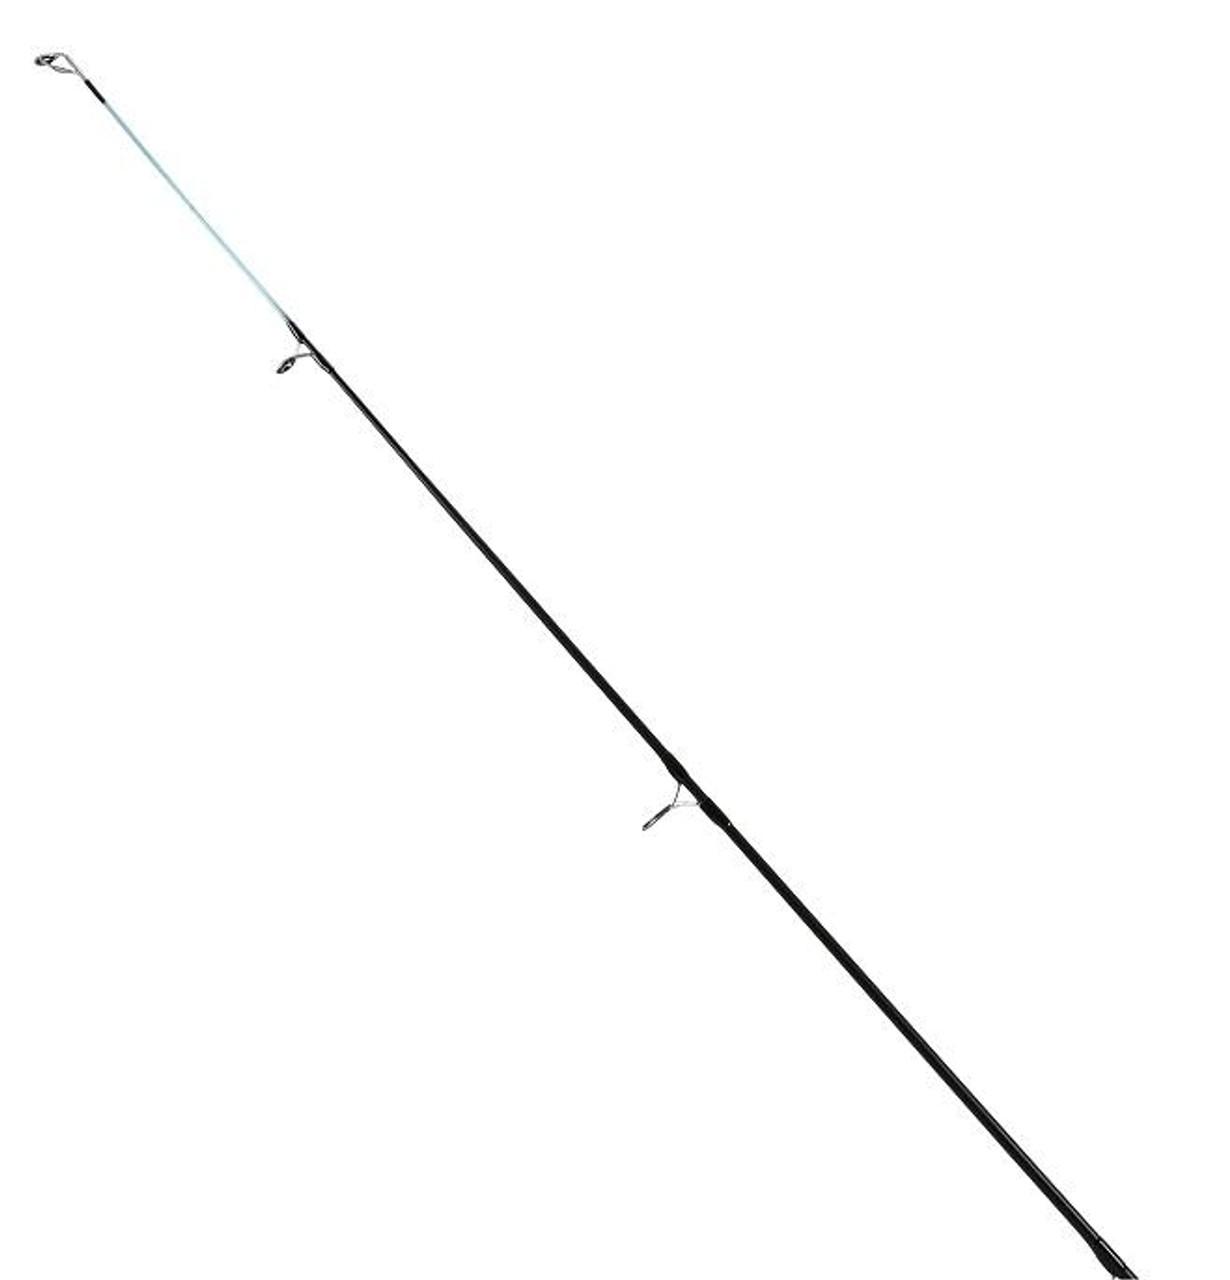 Okuma Tundra Pro Surf Spinning Rods TXP-S 10' To 15' CHOOSE YOUR MODEL!